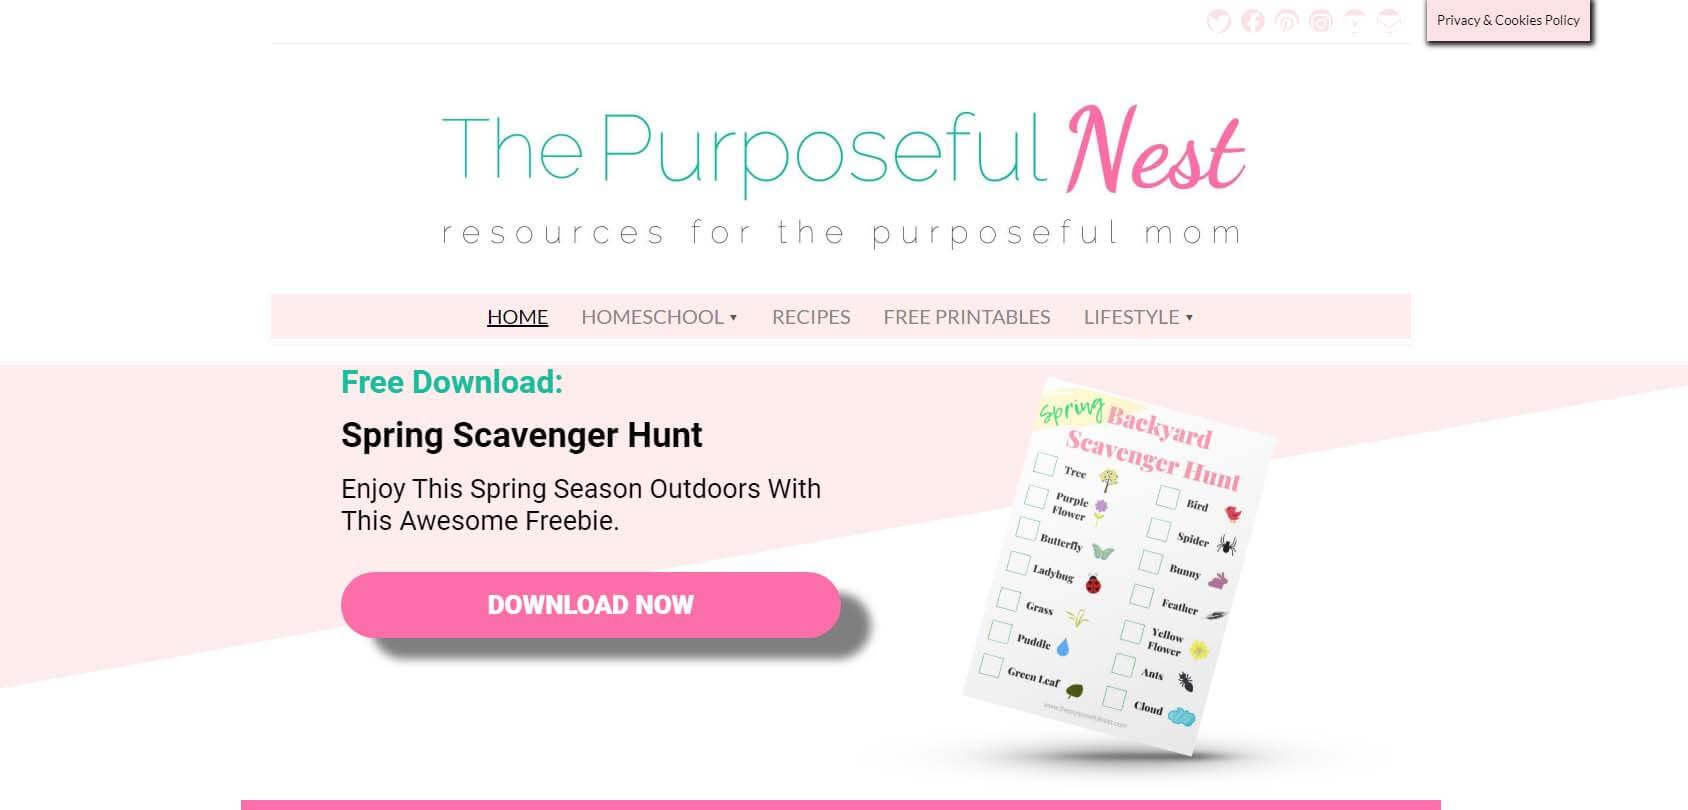 The Purposeful Nest Homepage